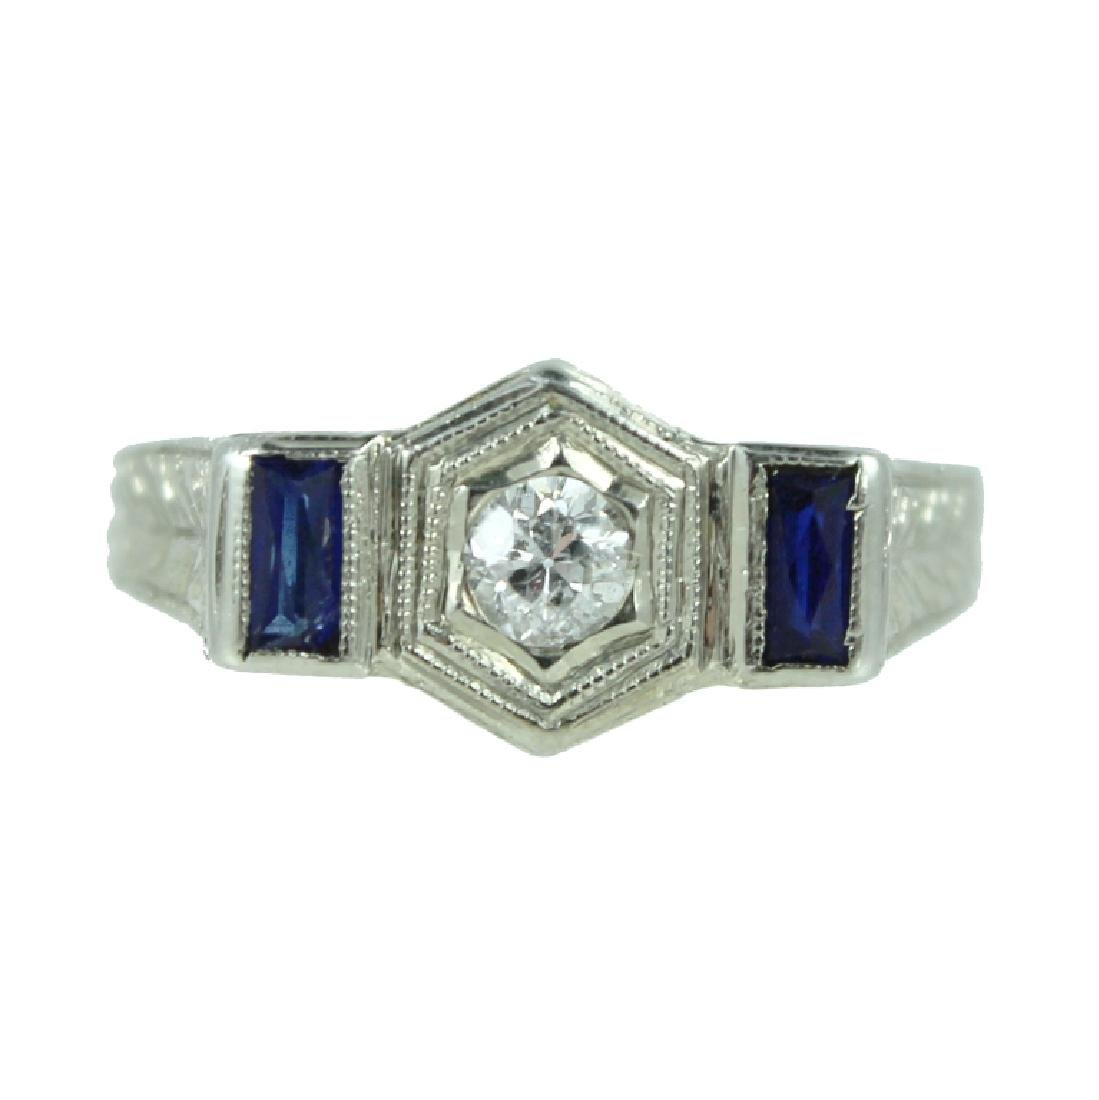 ART DECO 18K WHITE DIAMOND & SAPPHIRE RING